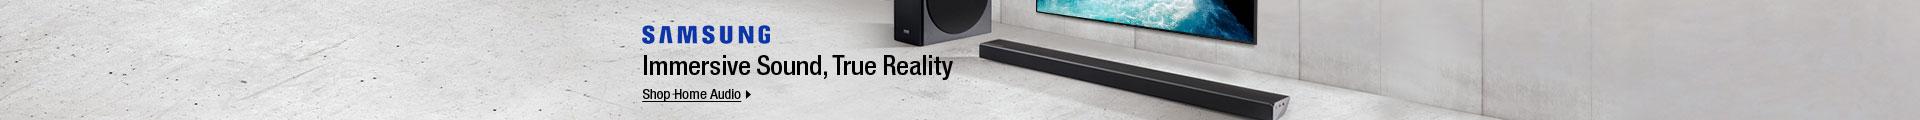 Samsung Immersive Sound, True Reality